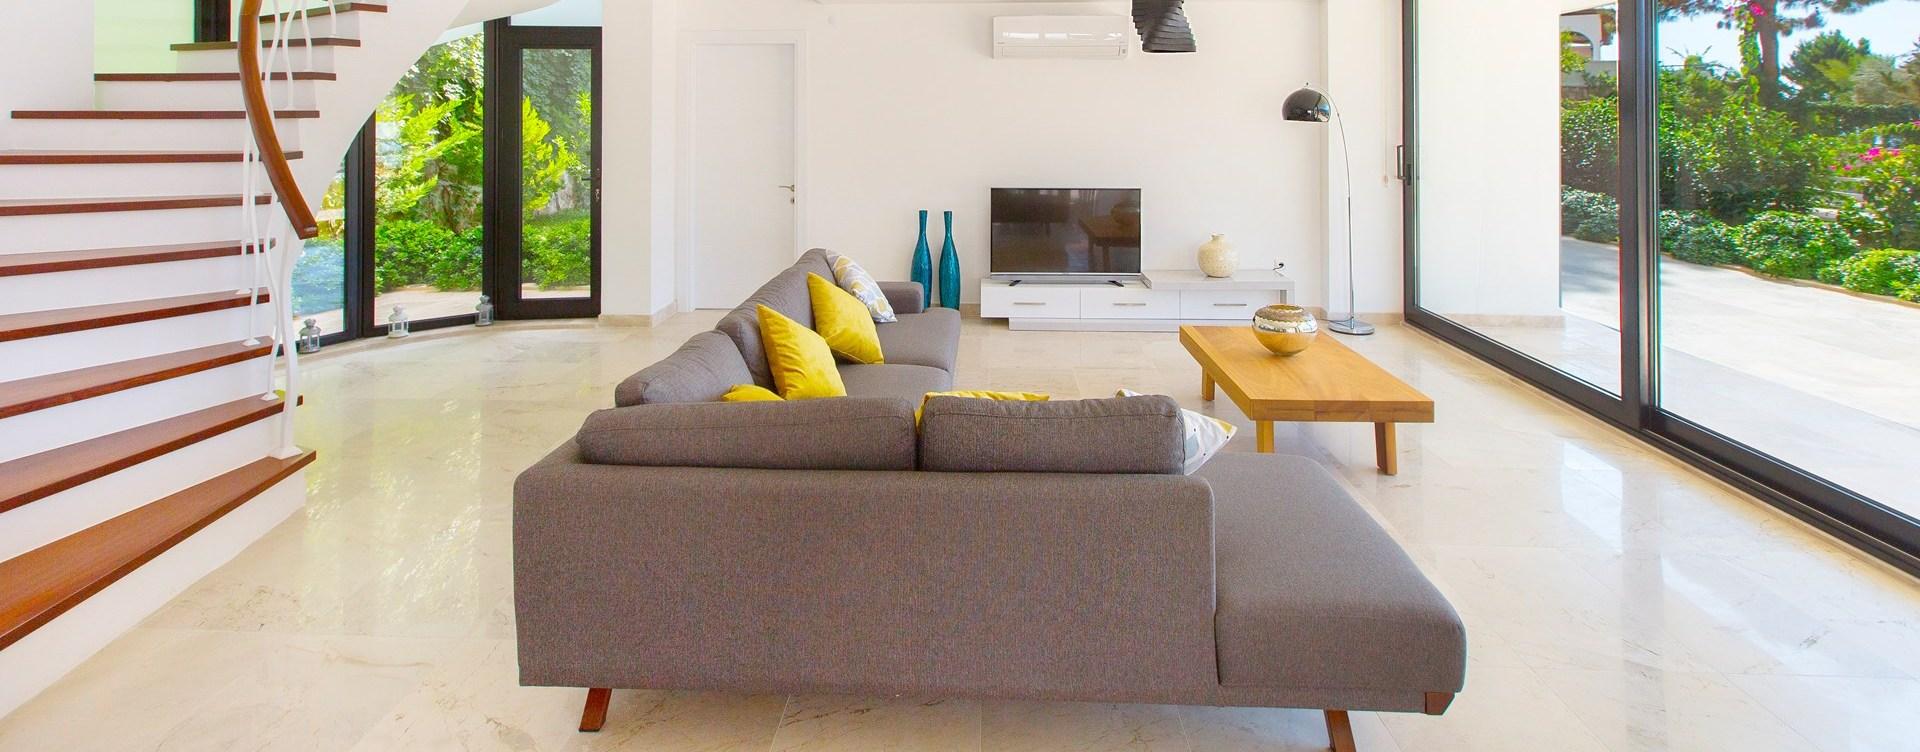 villa-kalamar-contemporary-interior